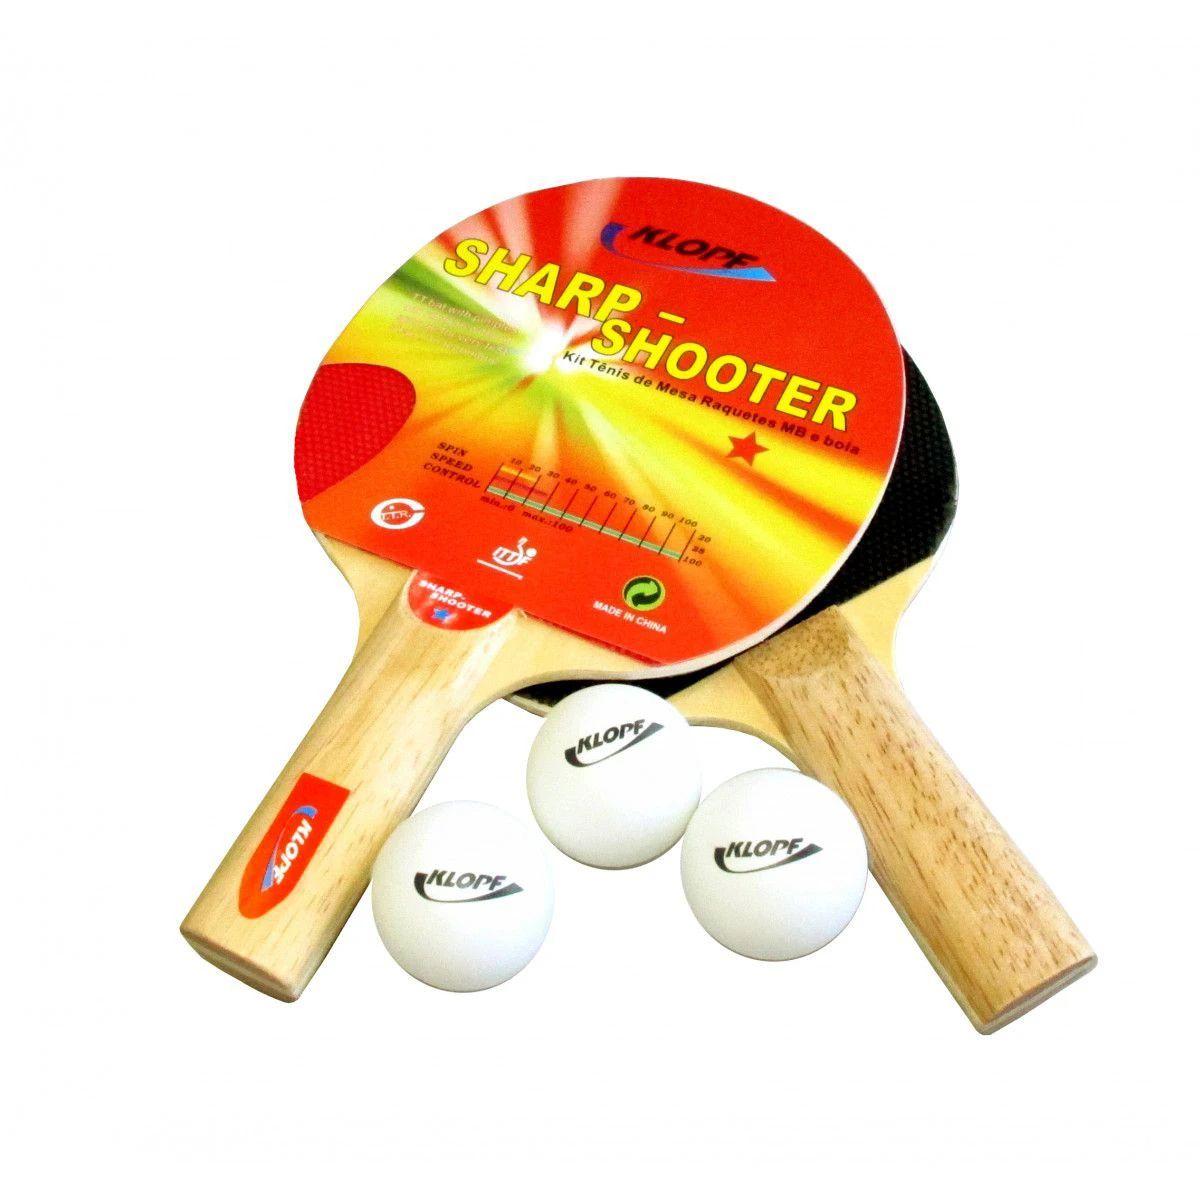 Kit de Tênis de Mesa Sharp Shooter - Klopf